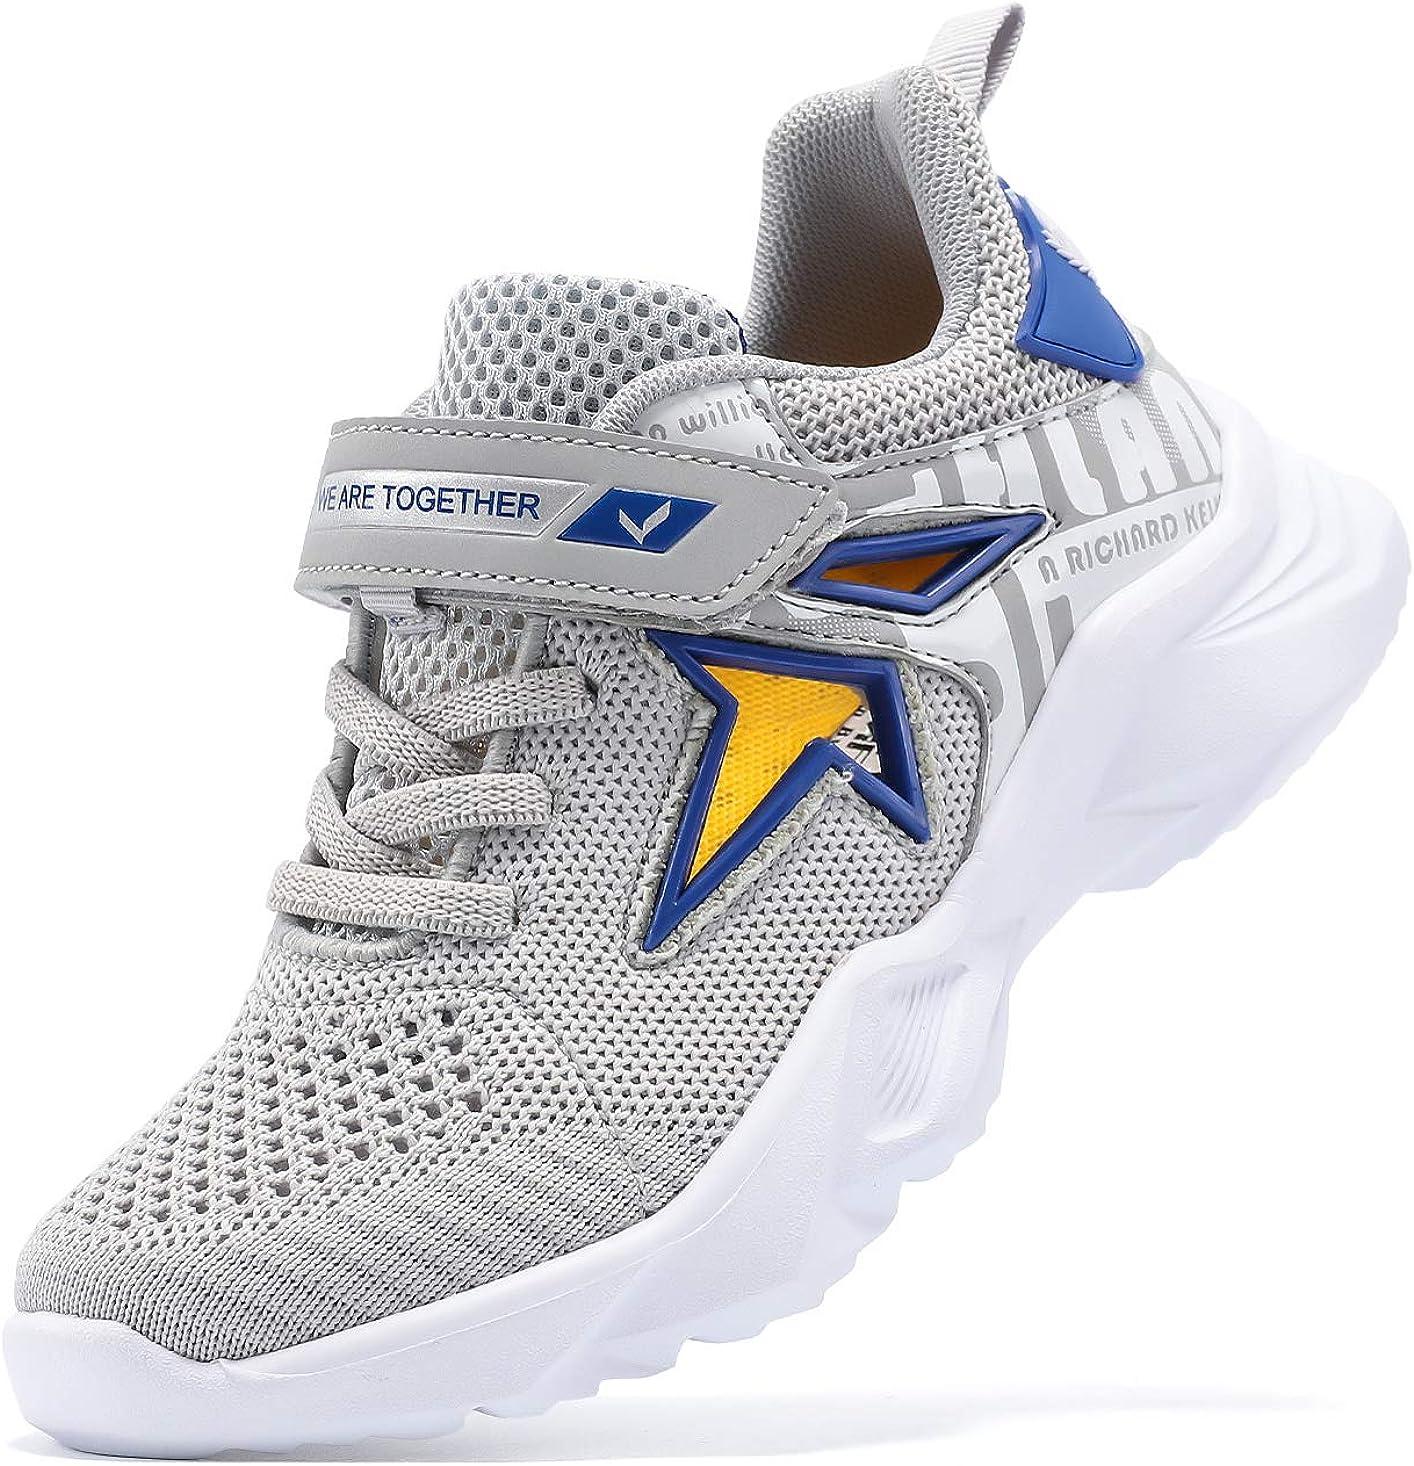 JMFCHI FASHION Boys Running Shoes Kids Sneakers Girls Athletic Tennis Shoe Breathable Lightweight Slip on Sports Knit Sock Sneaker